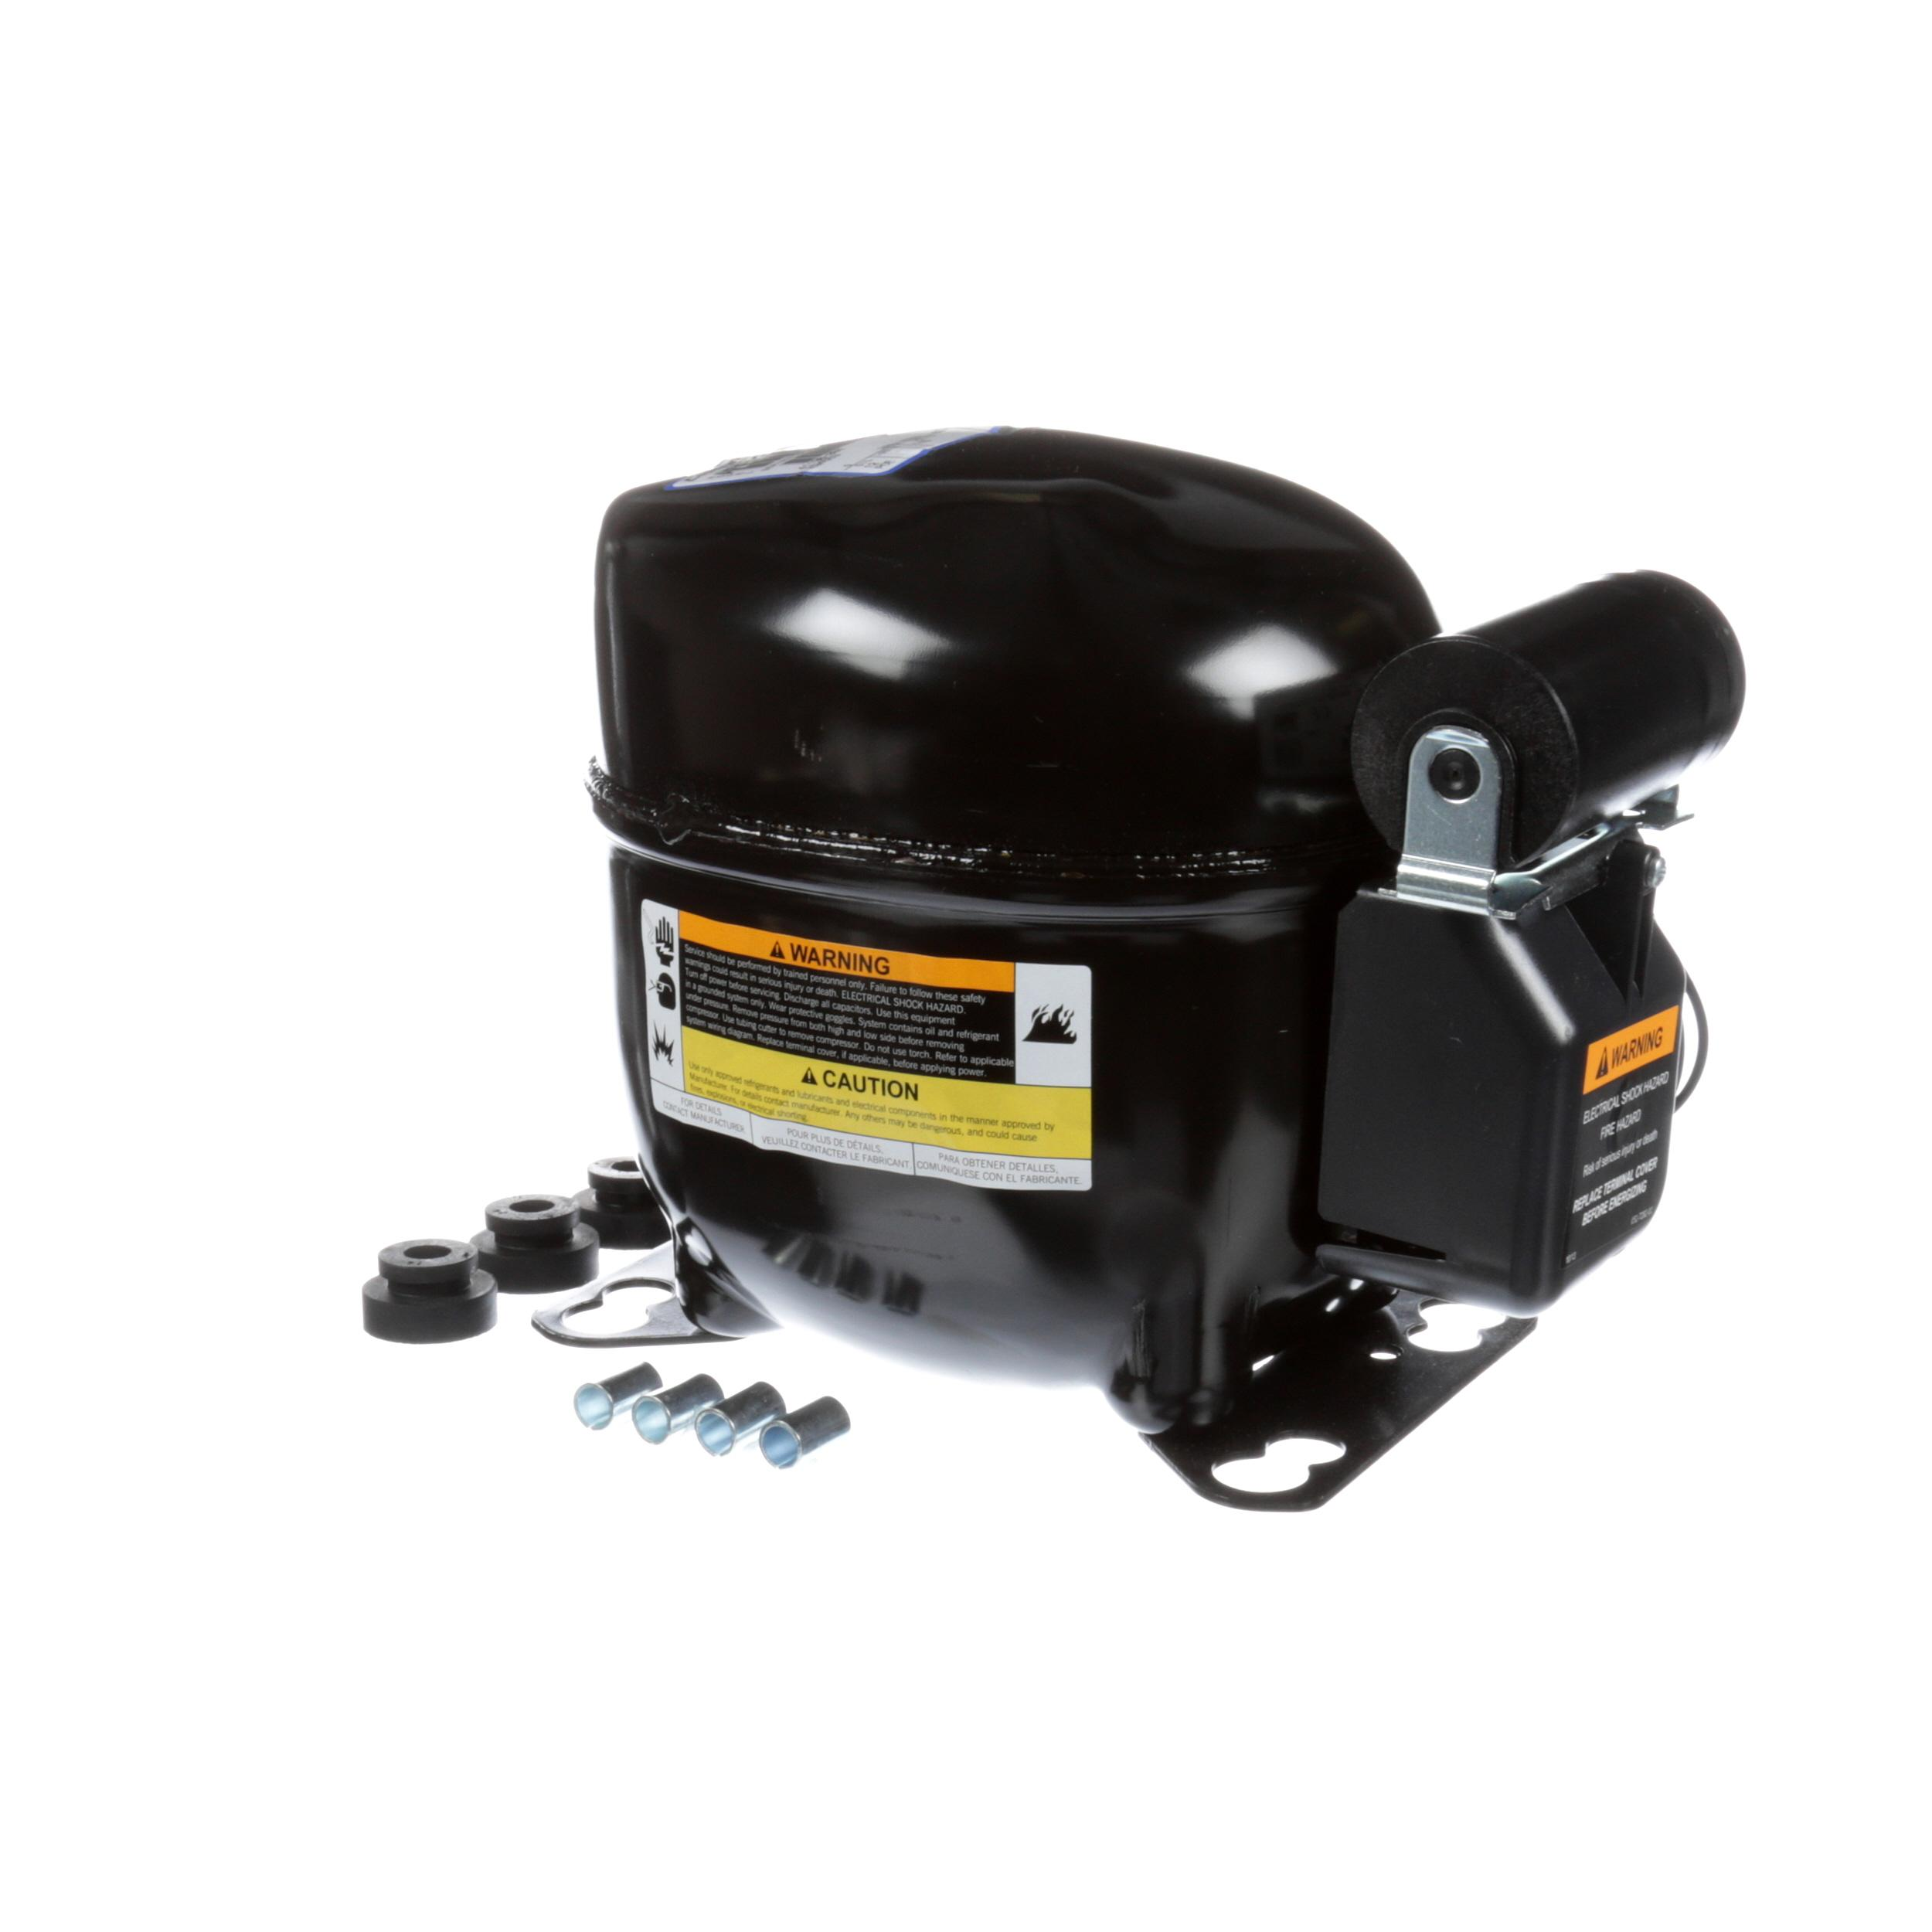 Copeland Compressor With Start Cap Wiring